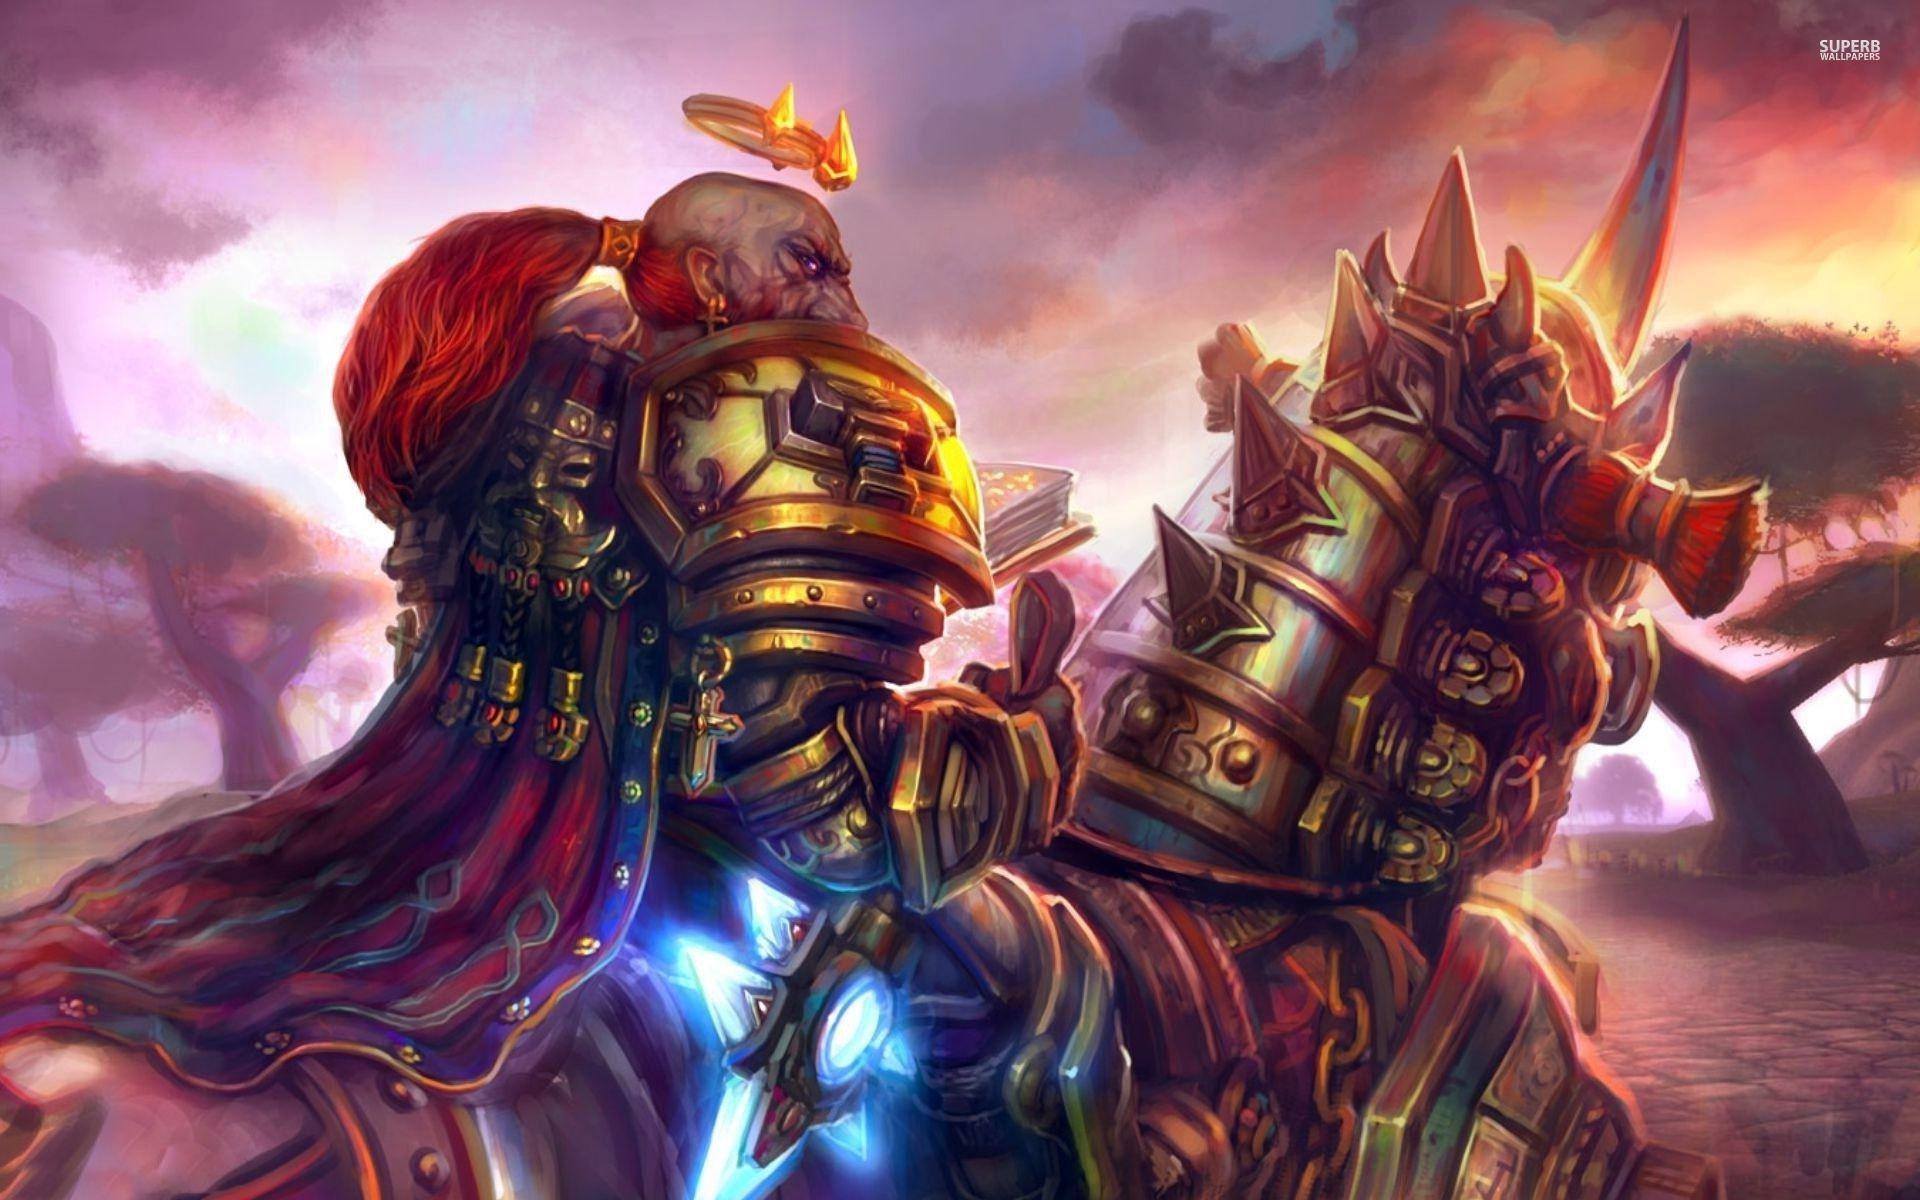 Res: 1920x1200, World Of Warcraft Wallpaper Paladin - wallpaper.